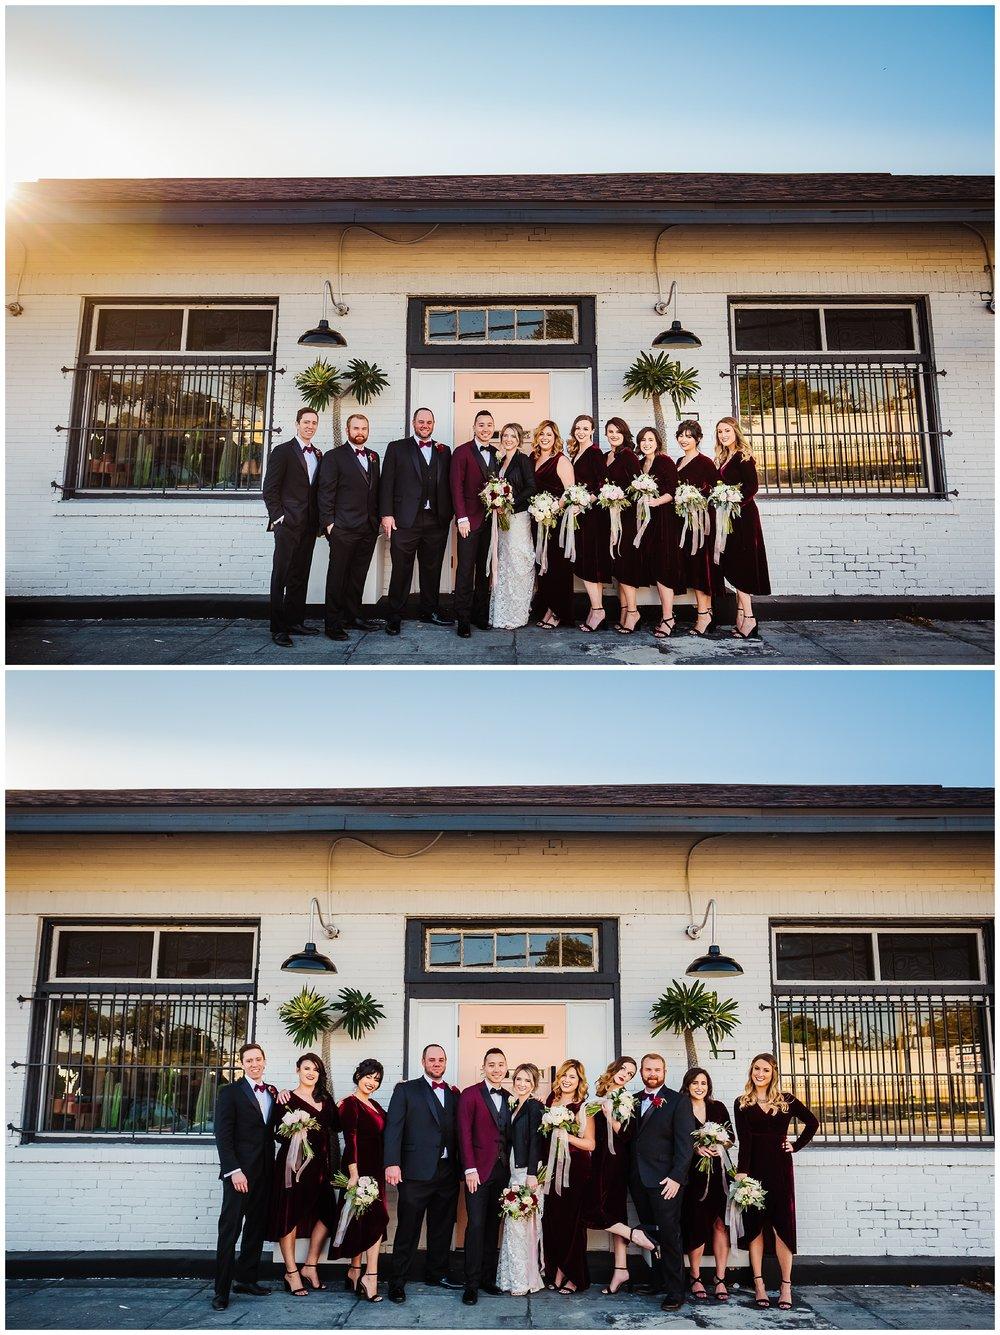 tampa-armeture-wedding-photographer-edgy-industrial-downtown-fancy-free-nursery-tattoo-burgandy-velvet_0038.jpg